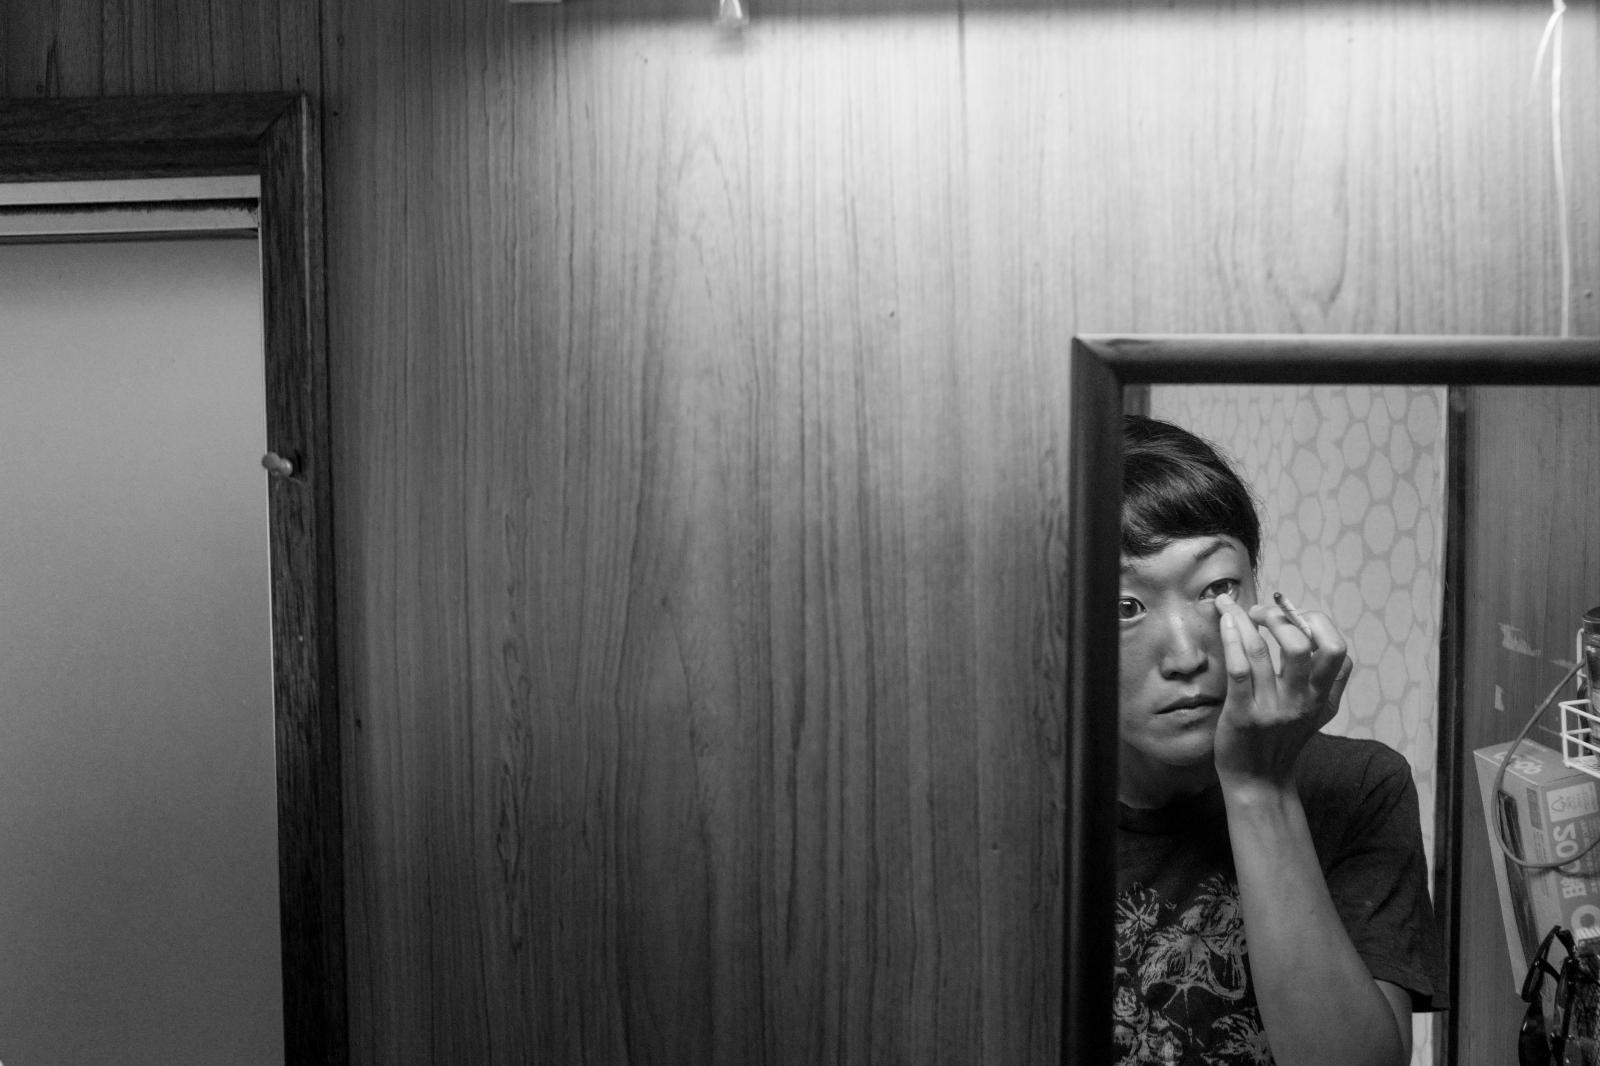 Ijikacho, Toba, Aiko Ohno puts make up inside her house.